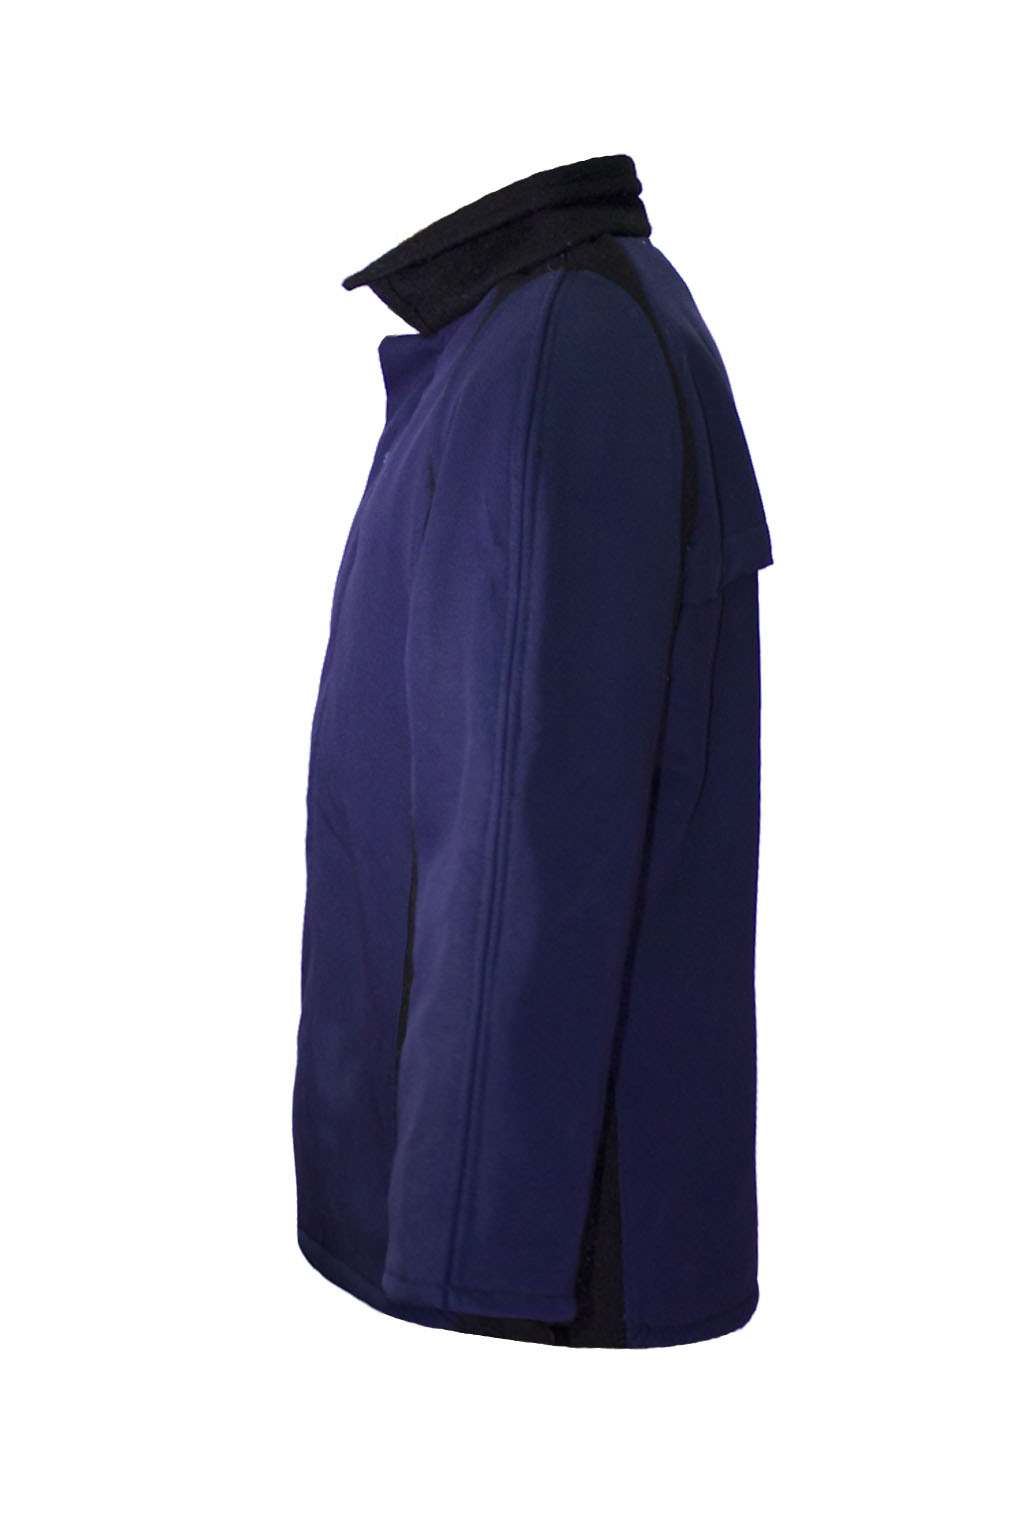 Купить Куртку Металлурга